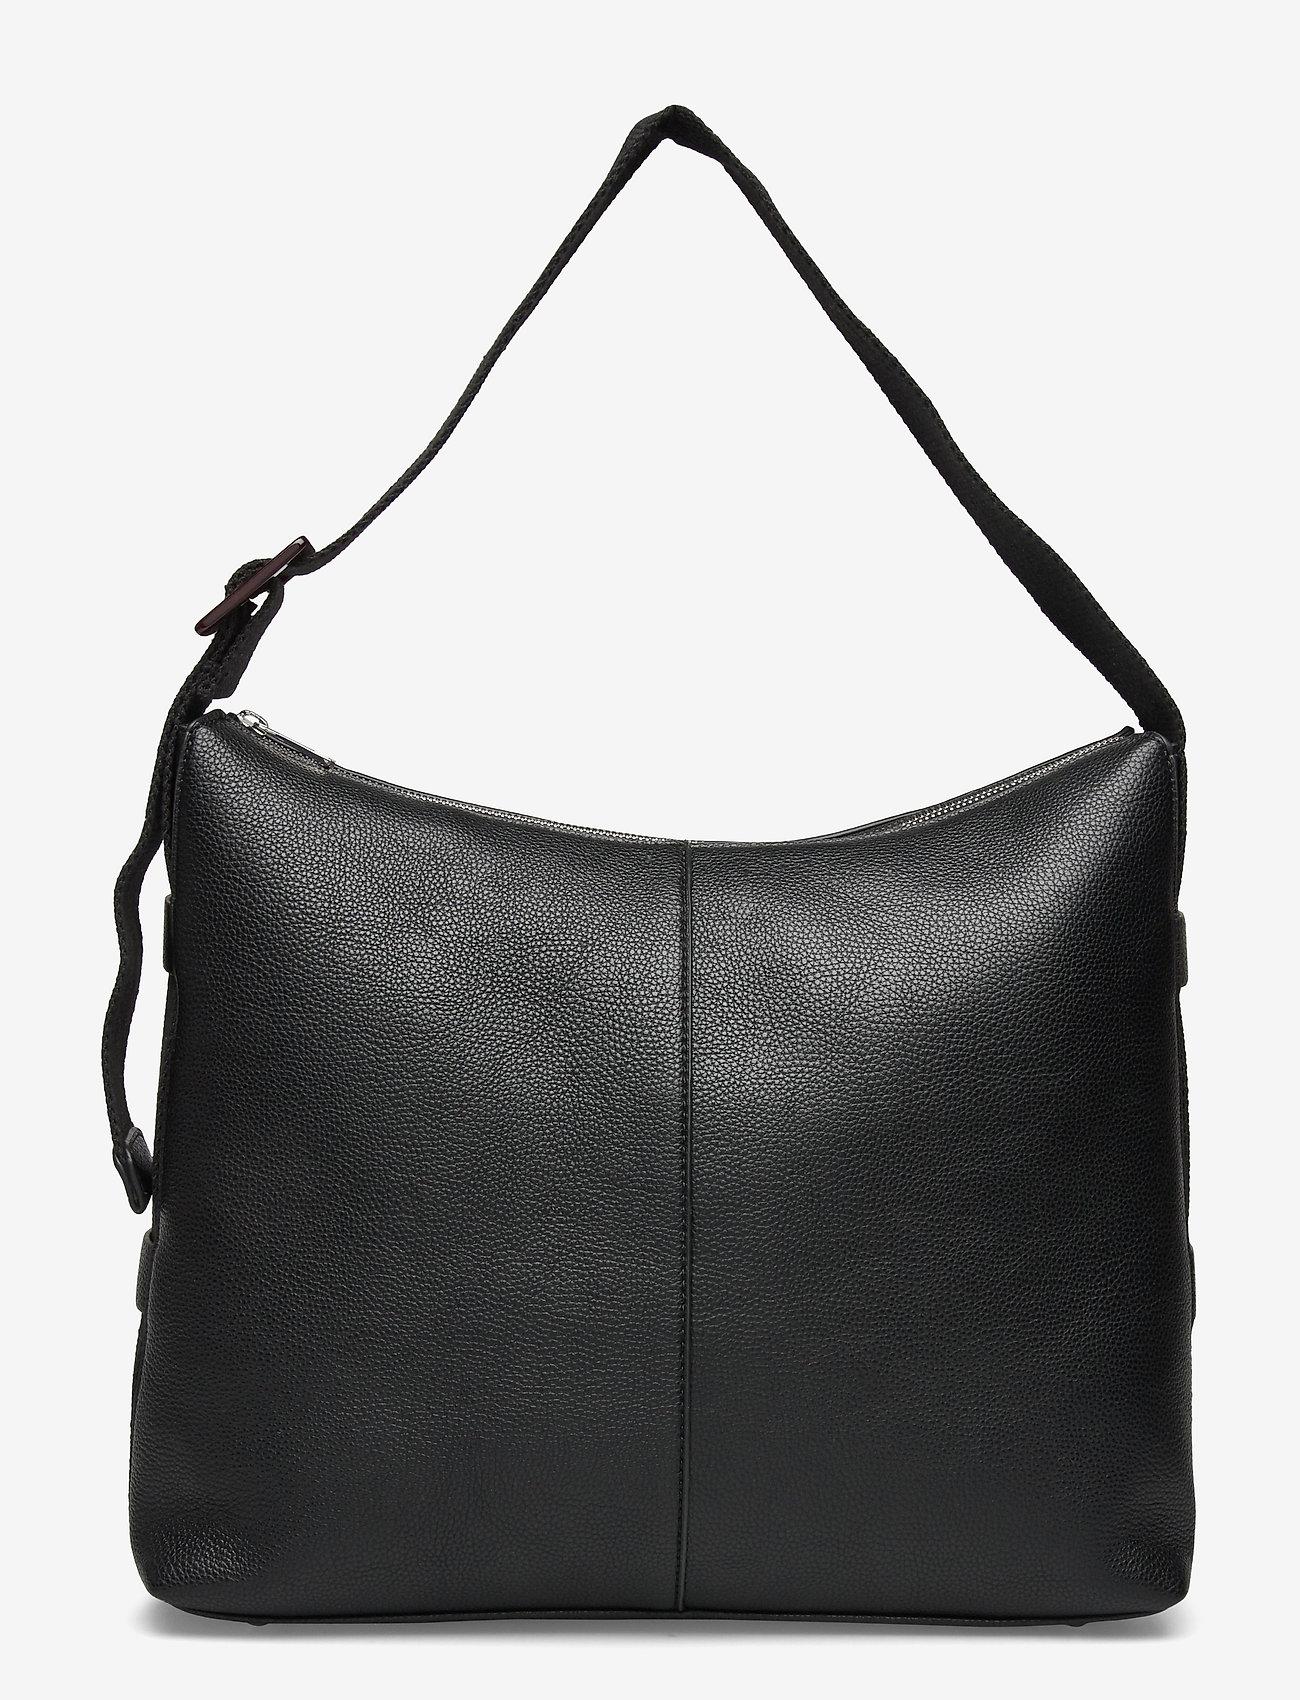 HVISK - BRINY STRUCTURED - handväskor - black - 0